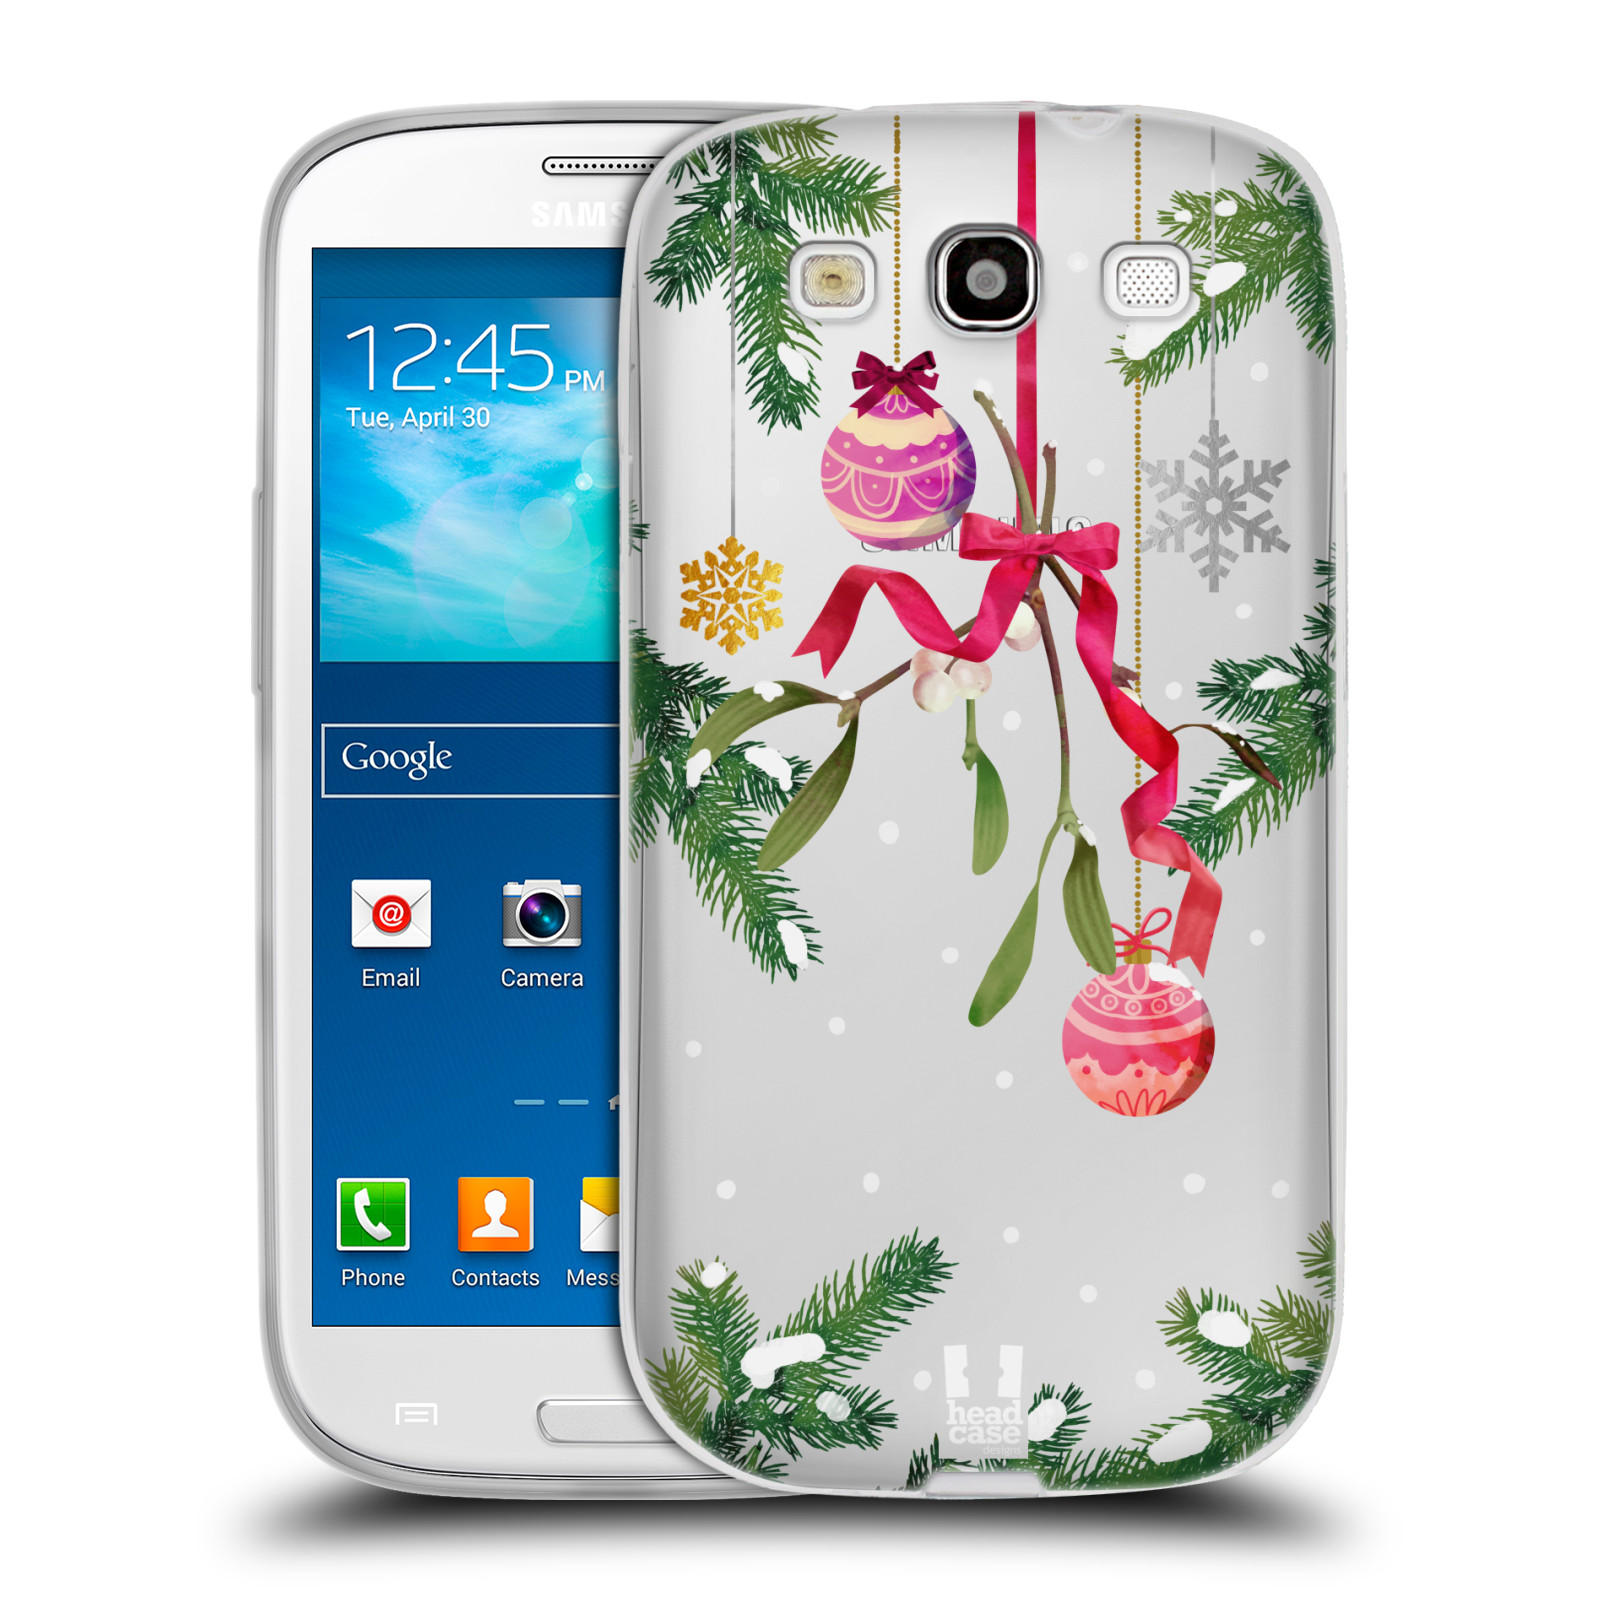 Silikonové pouzdro na mobil Samsung Galaxy S3 Neo - Head Case - Větvičky a vánoční ozdoby